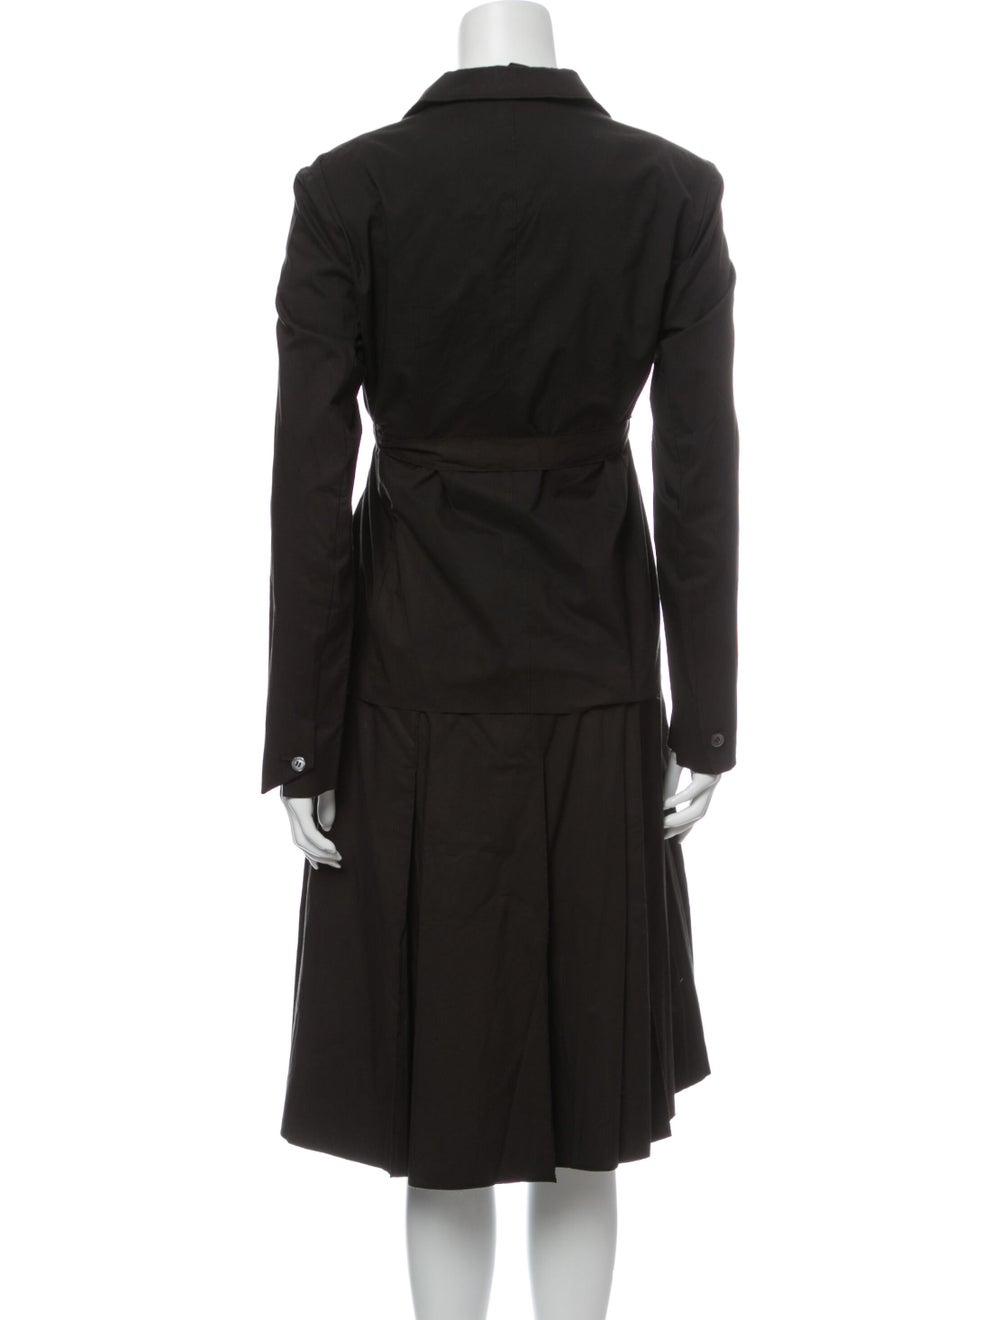 Prada Vintage 1990's Skirt Set Brown - image 3